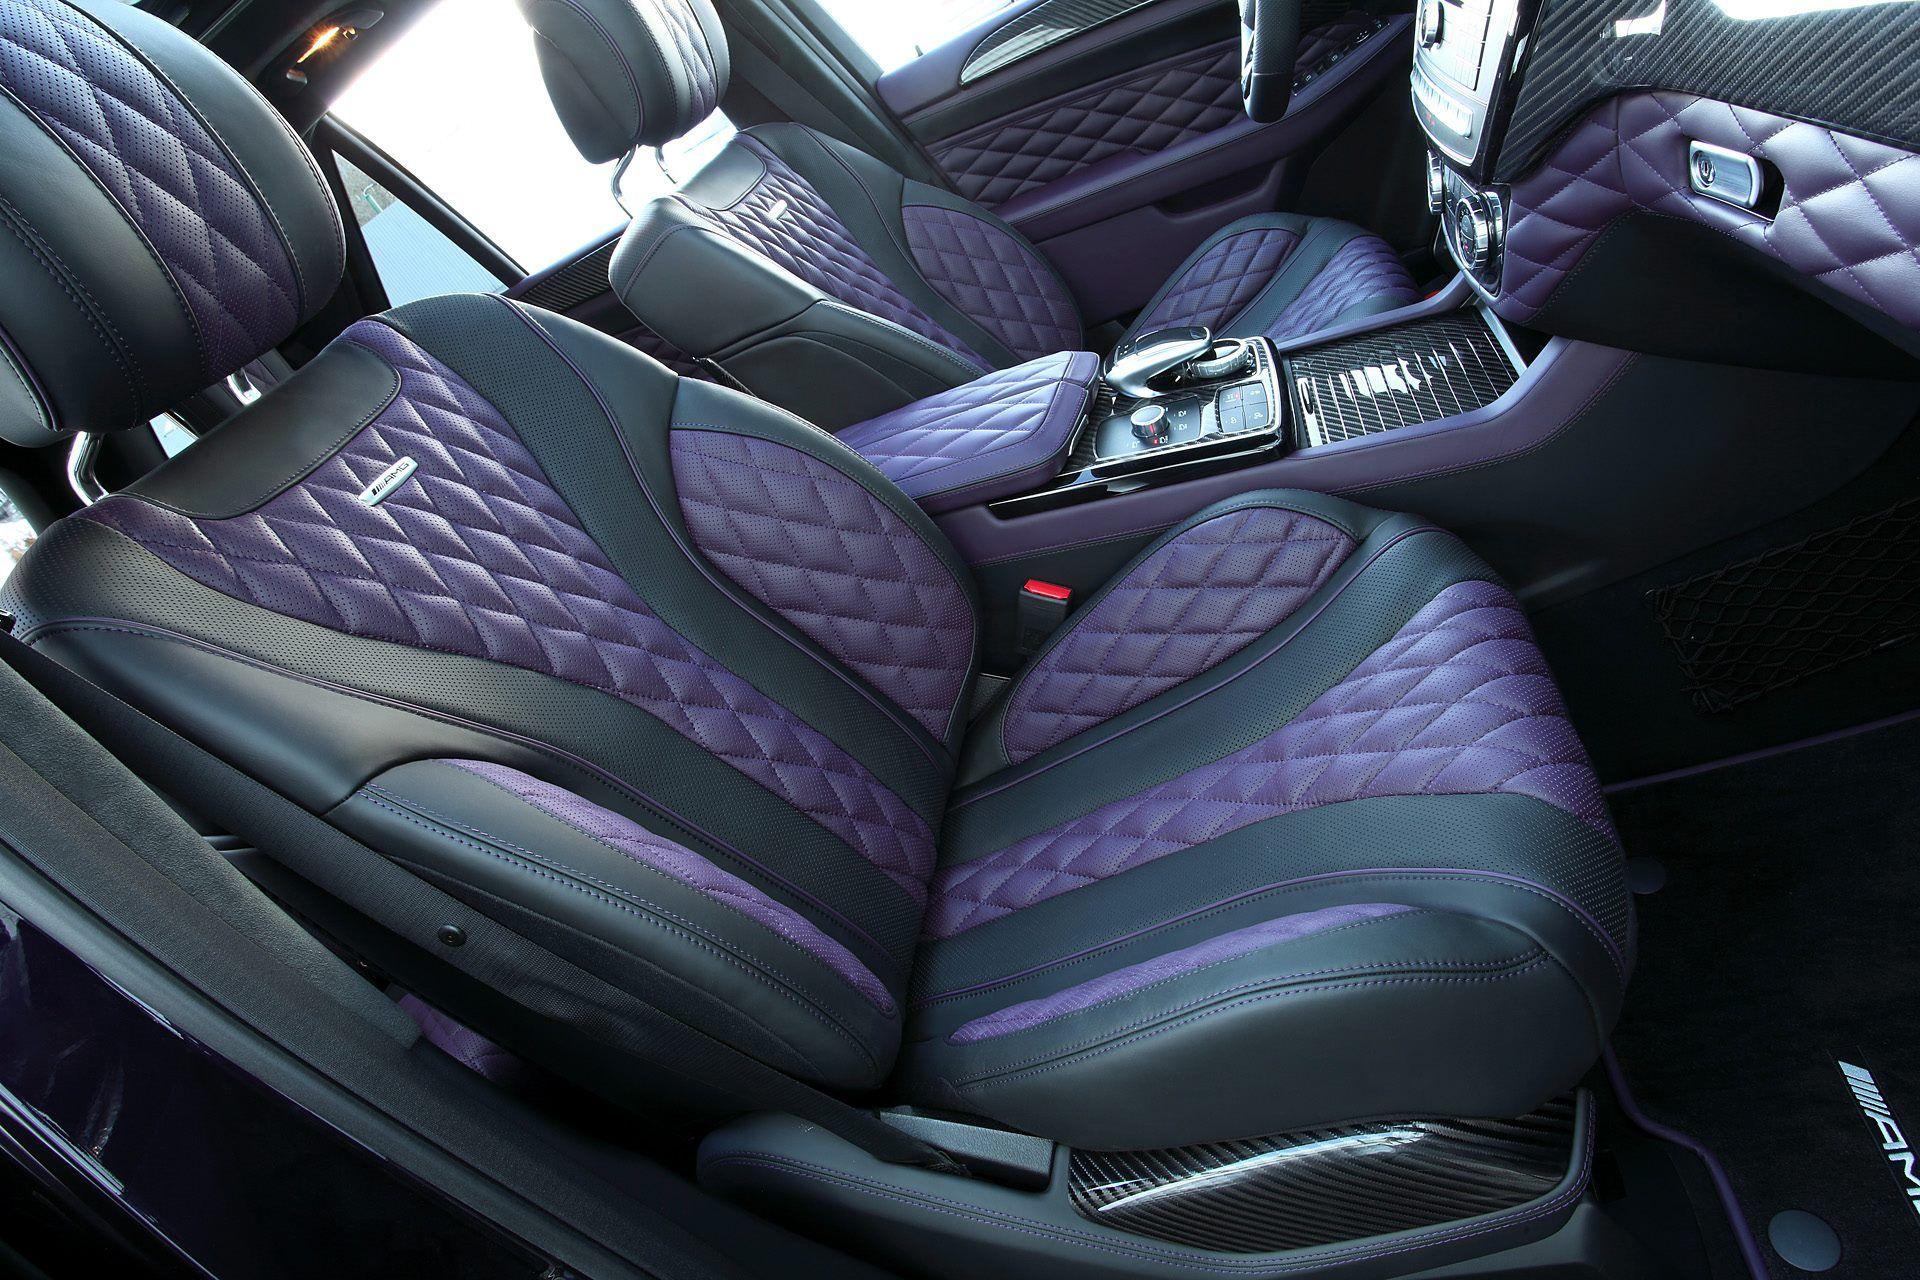 carbon mercedes amg gle 63 by topcar has purple leather interior autoevolution. Black Bedroom Furniture Sets. Home Design Ideas